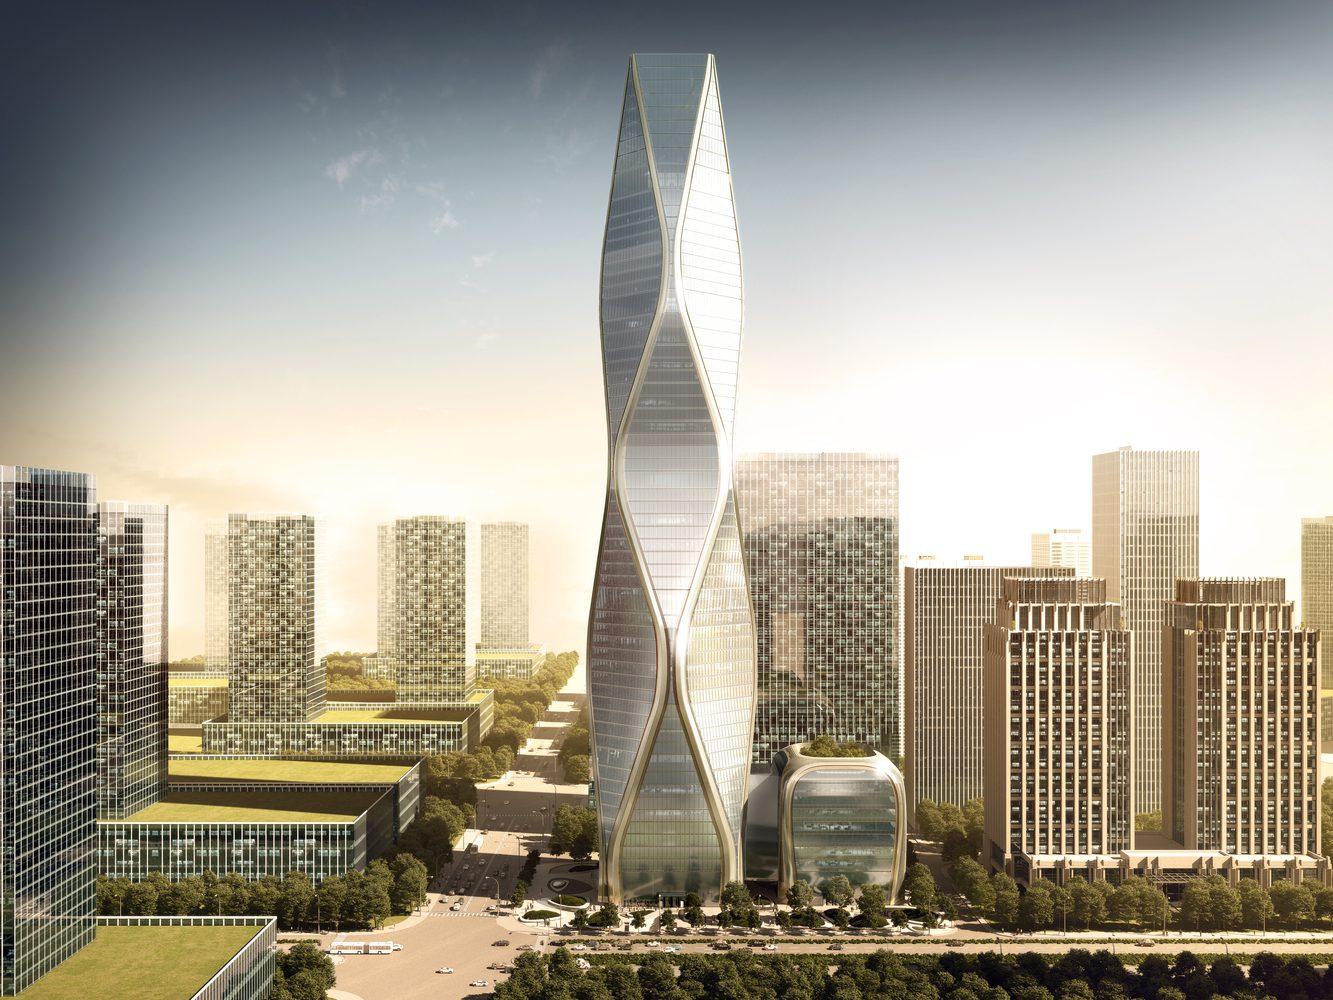 SOM Architects - Tower - China - Hangzhou - IGS Magazine - Press Release - 8